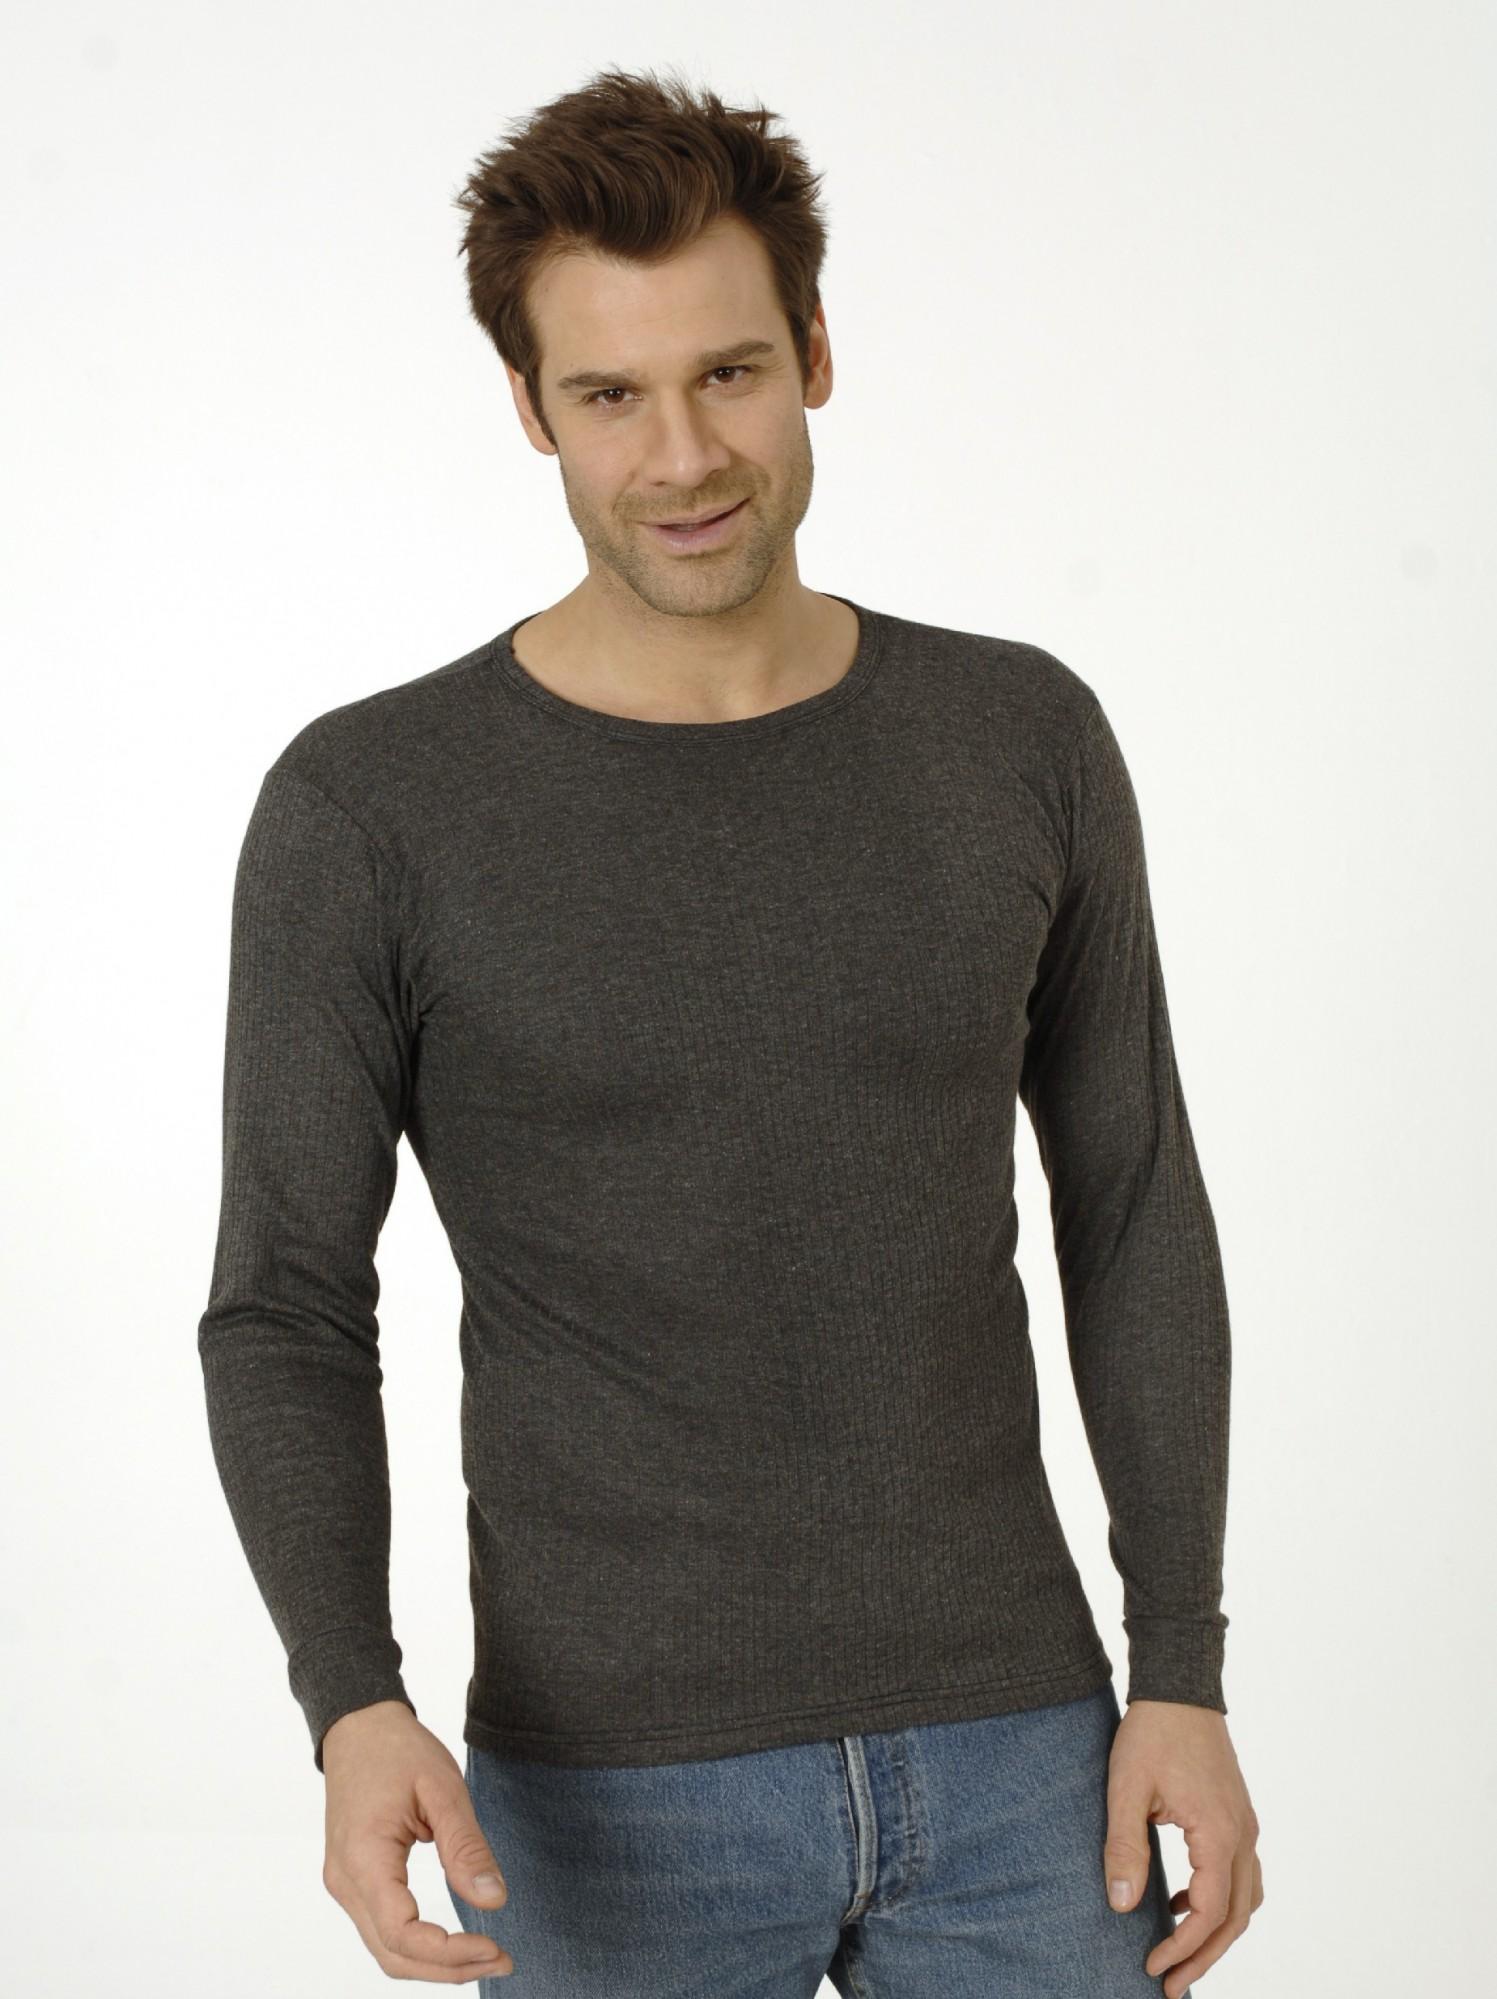 Herren Thermo Unterhemd, 1/1-Arm, langarm, 17003 001